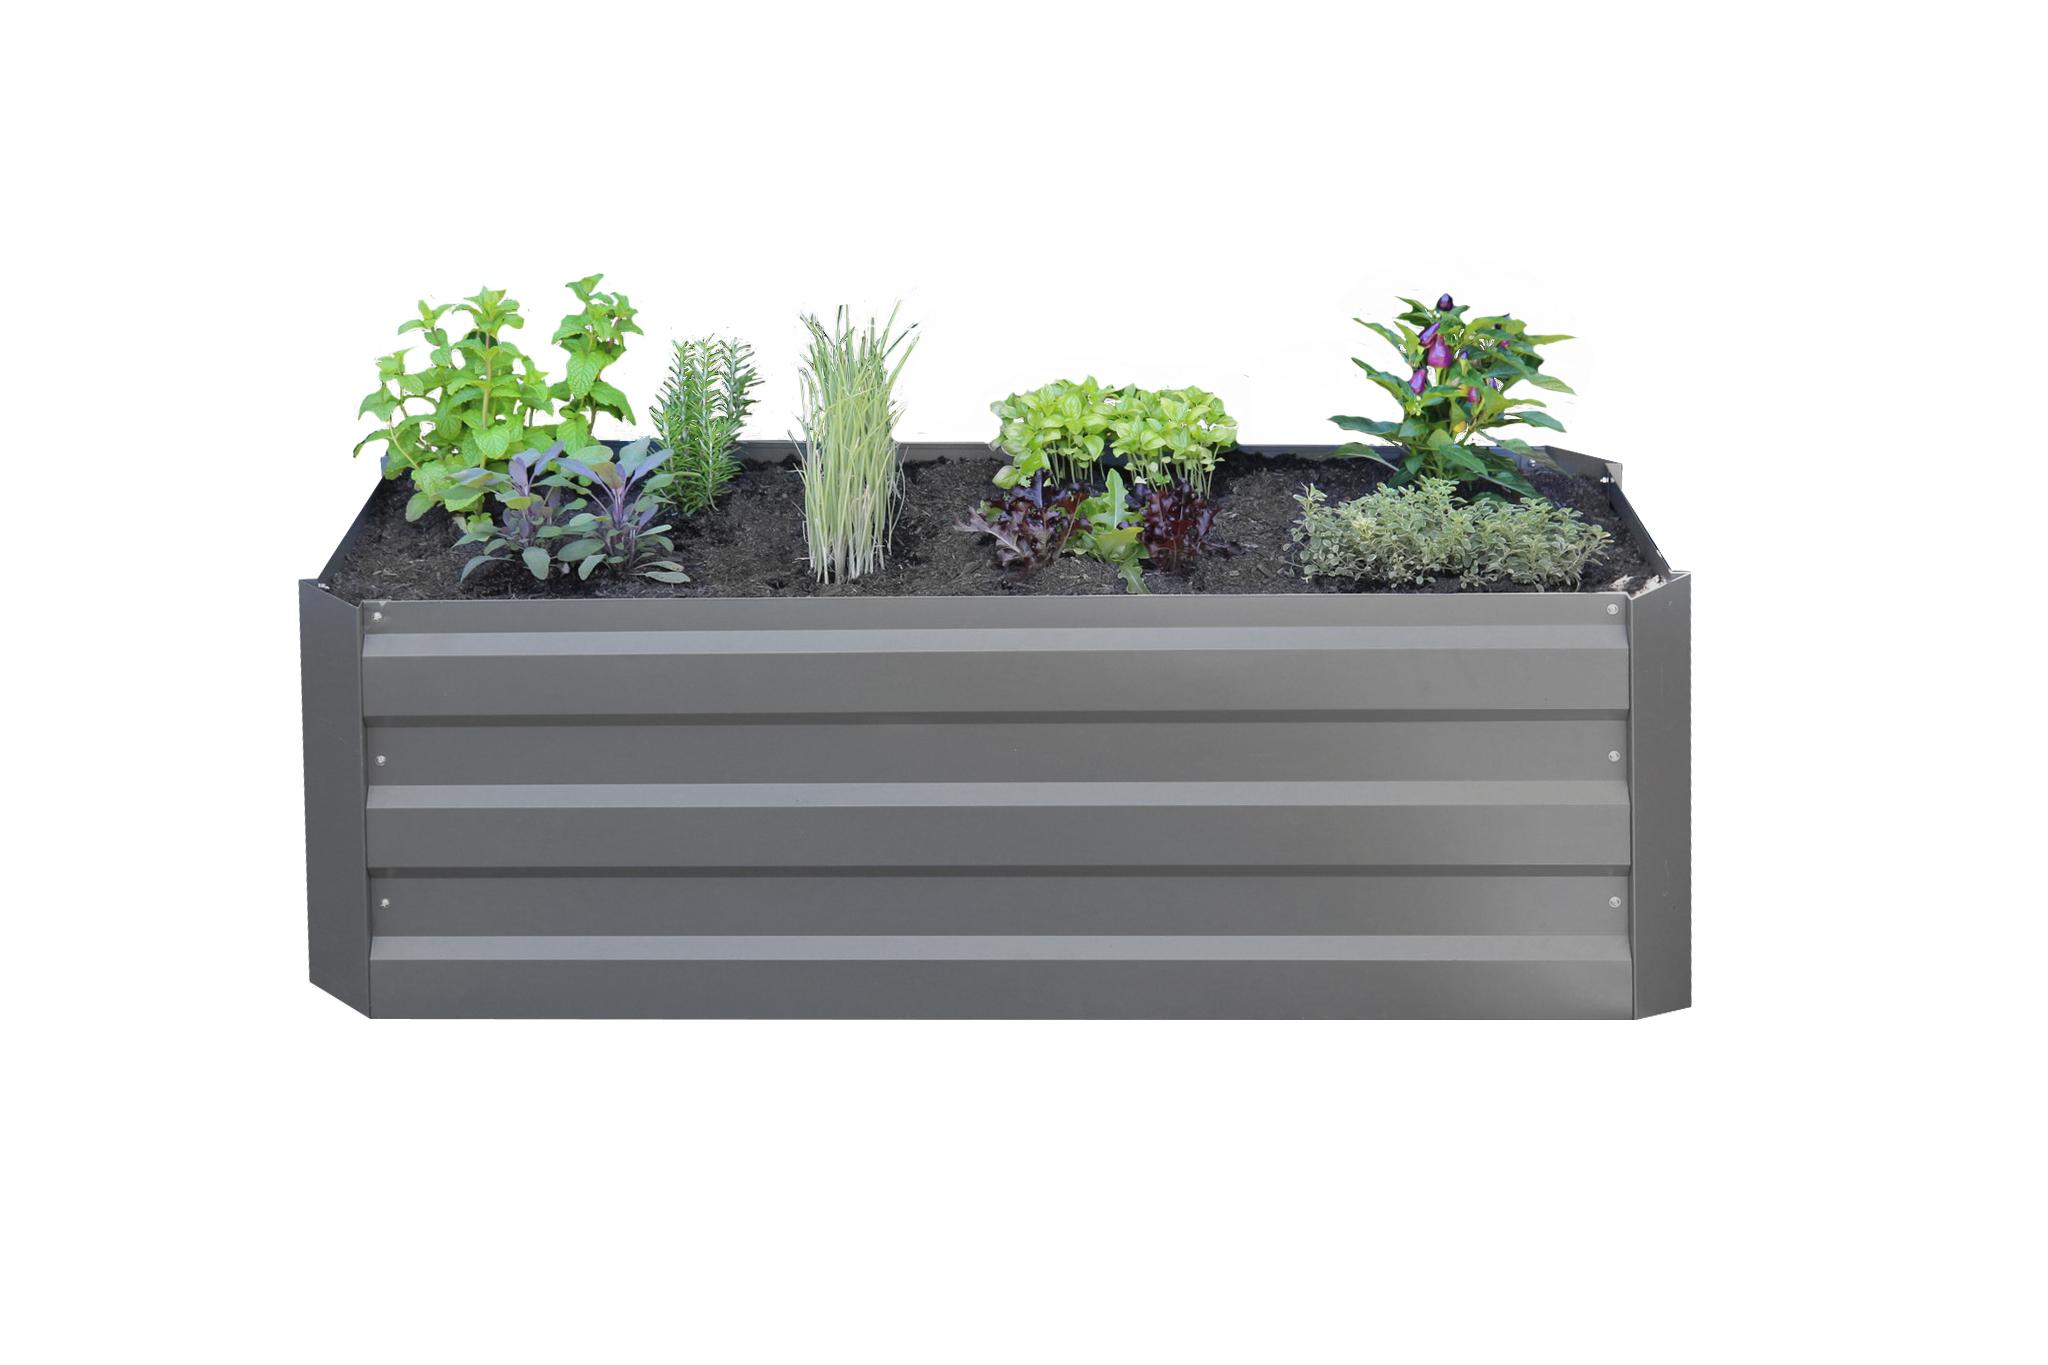 Gardenlife - Easy Raised Bed 52 x 95 cm - Small (131664)